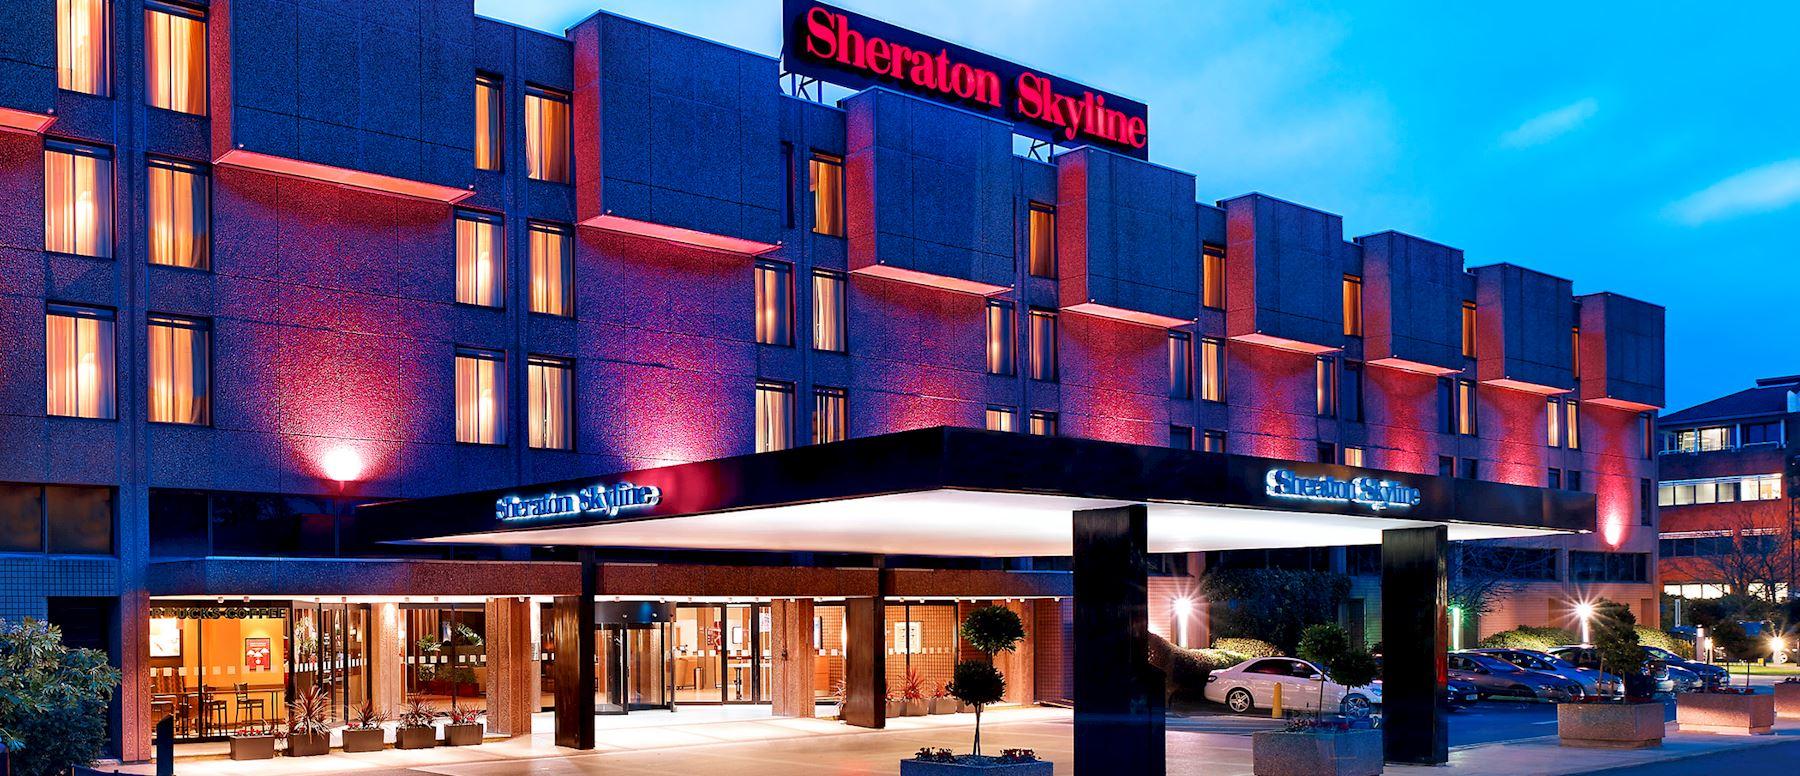 Sheraton Skyline Hotel, London Heathrow